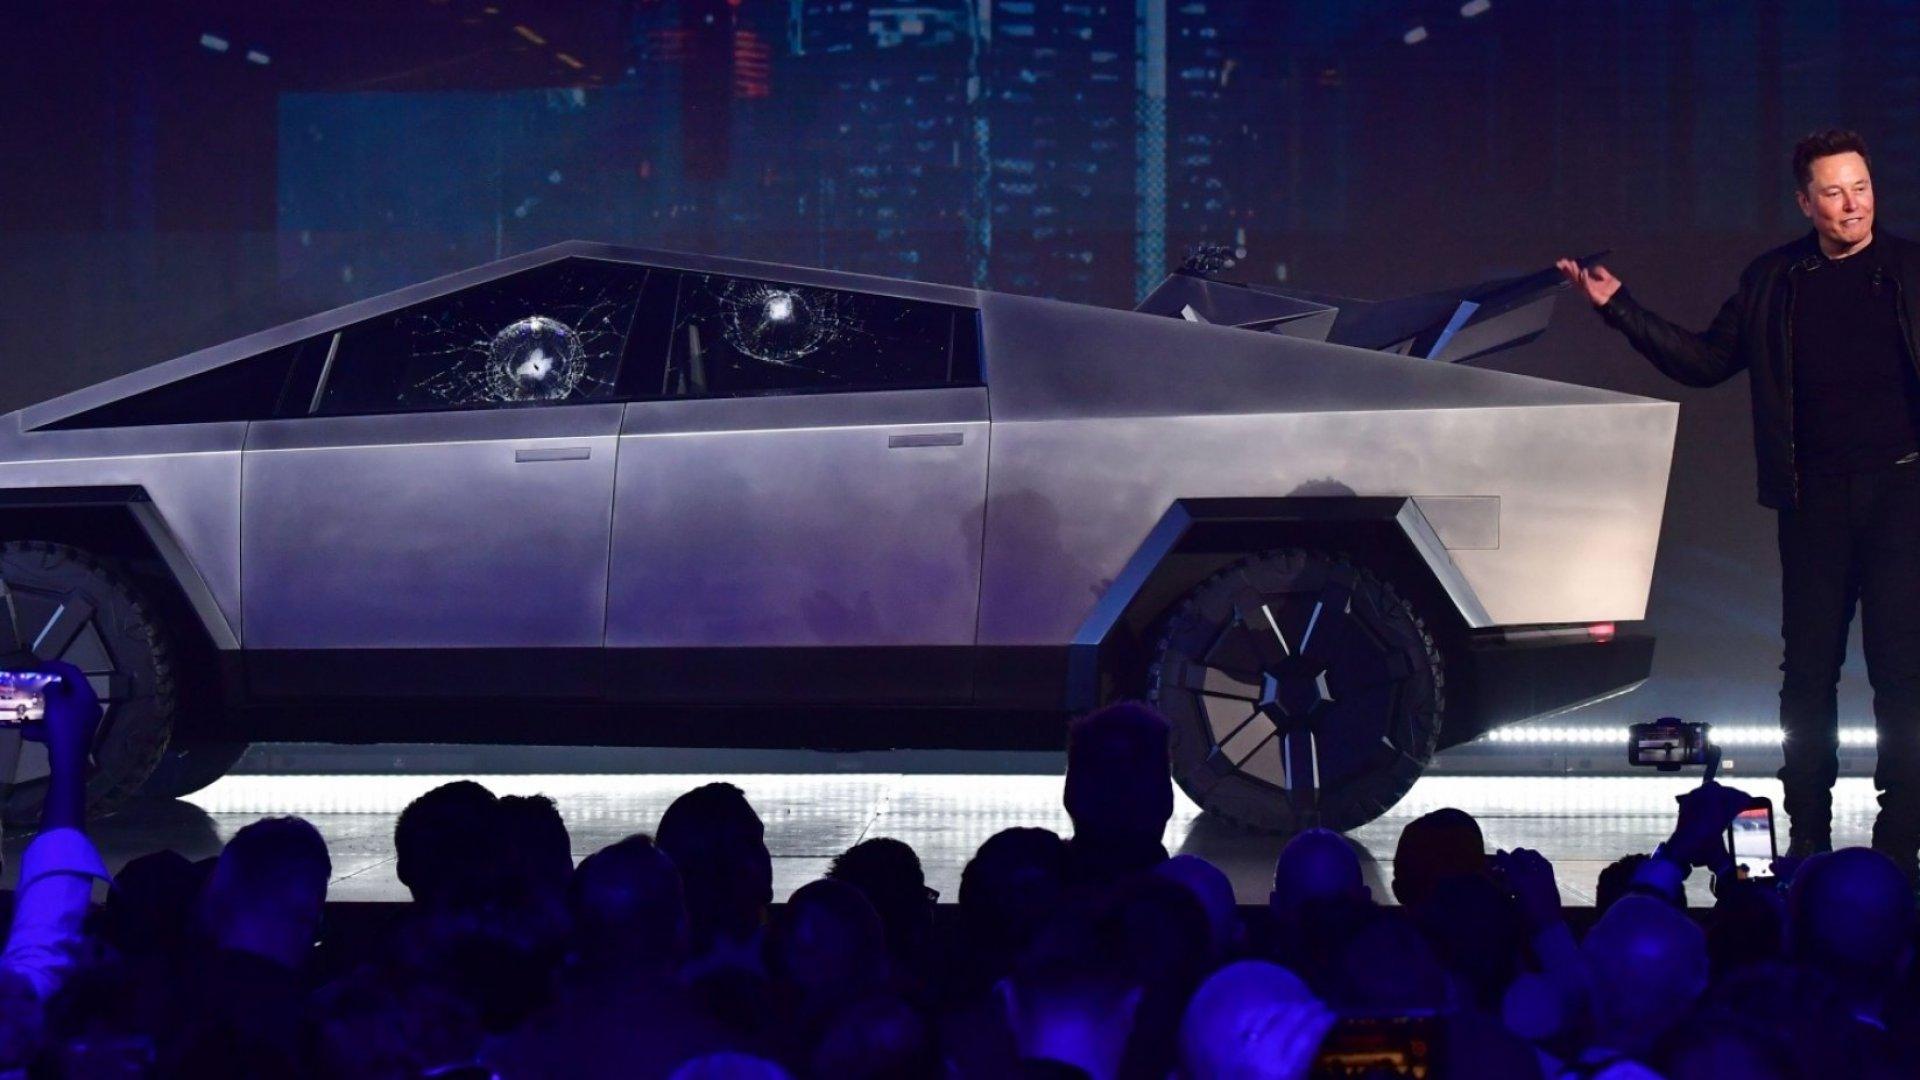 Elon Musk and Tesla's Cybertruck.